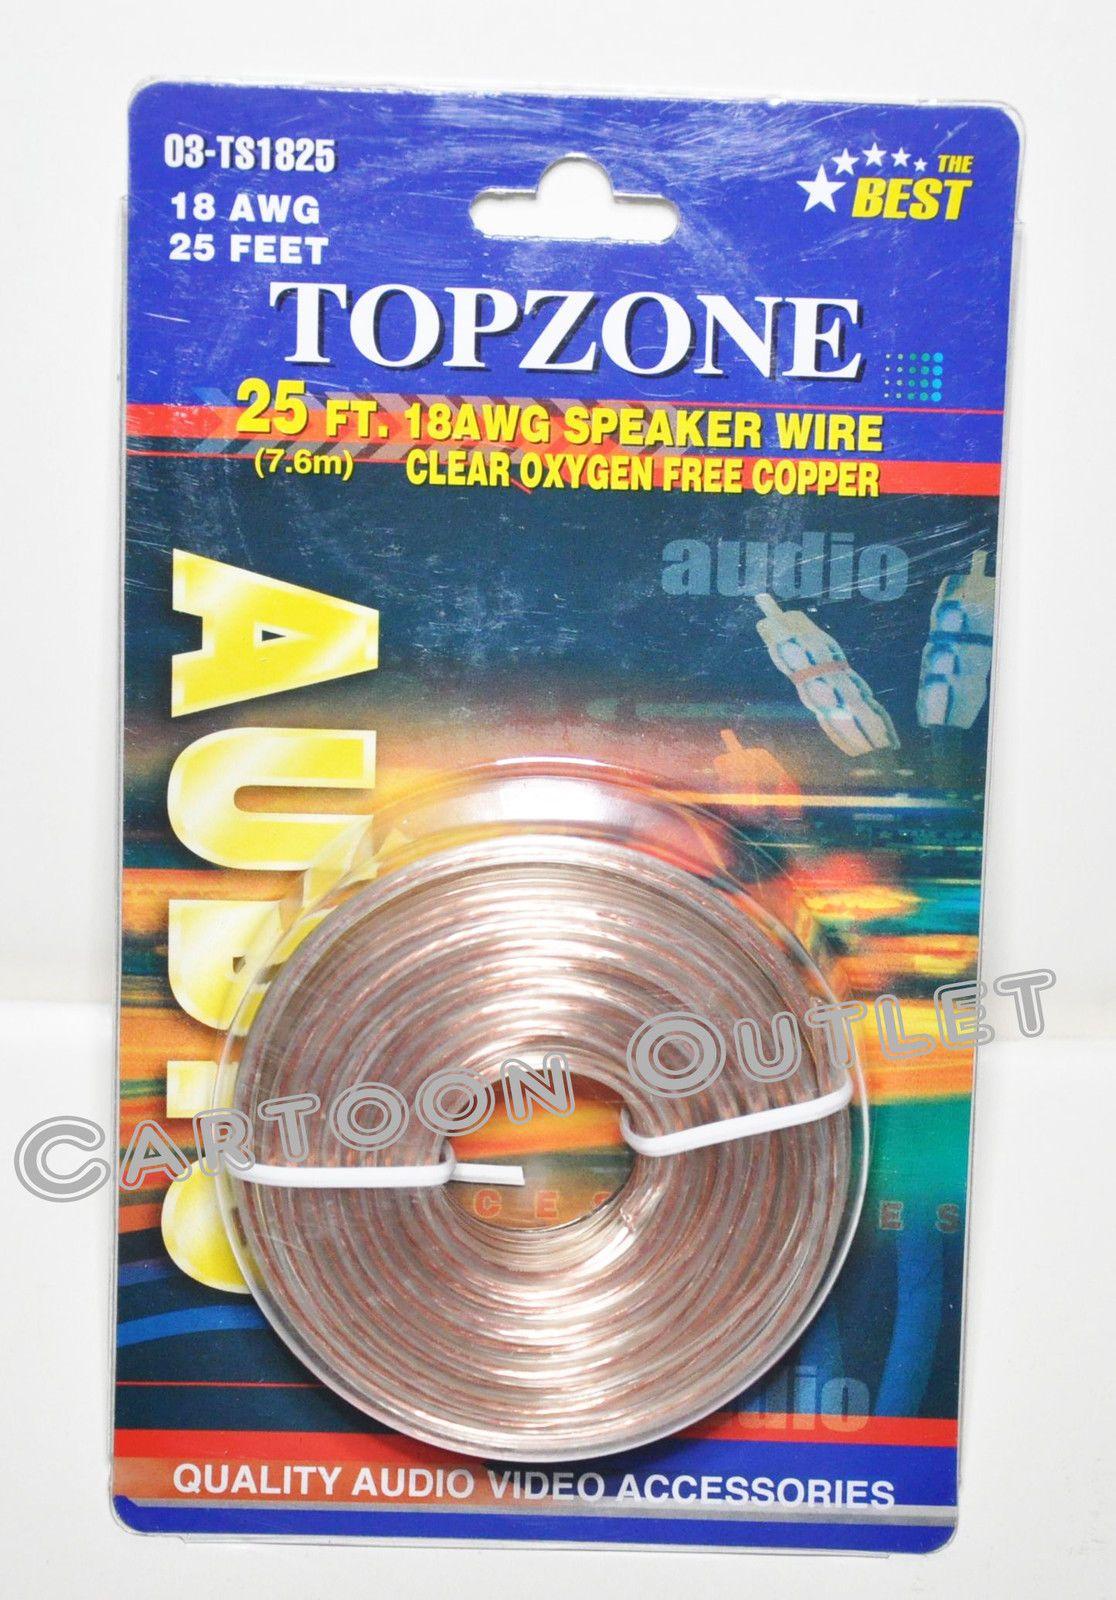 $6 99 - 25 Ft Speaker Wire 18 Awg Clear Oxygen Free Copper